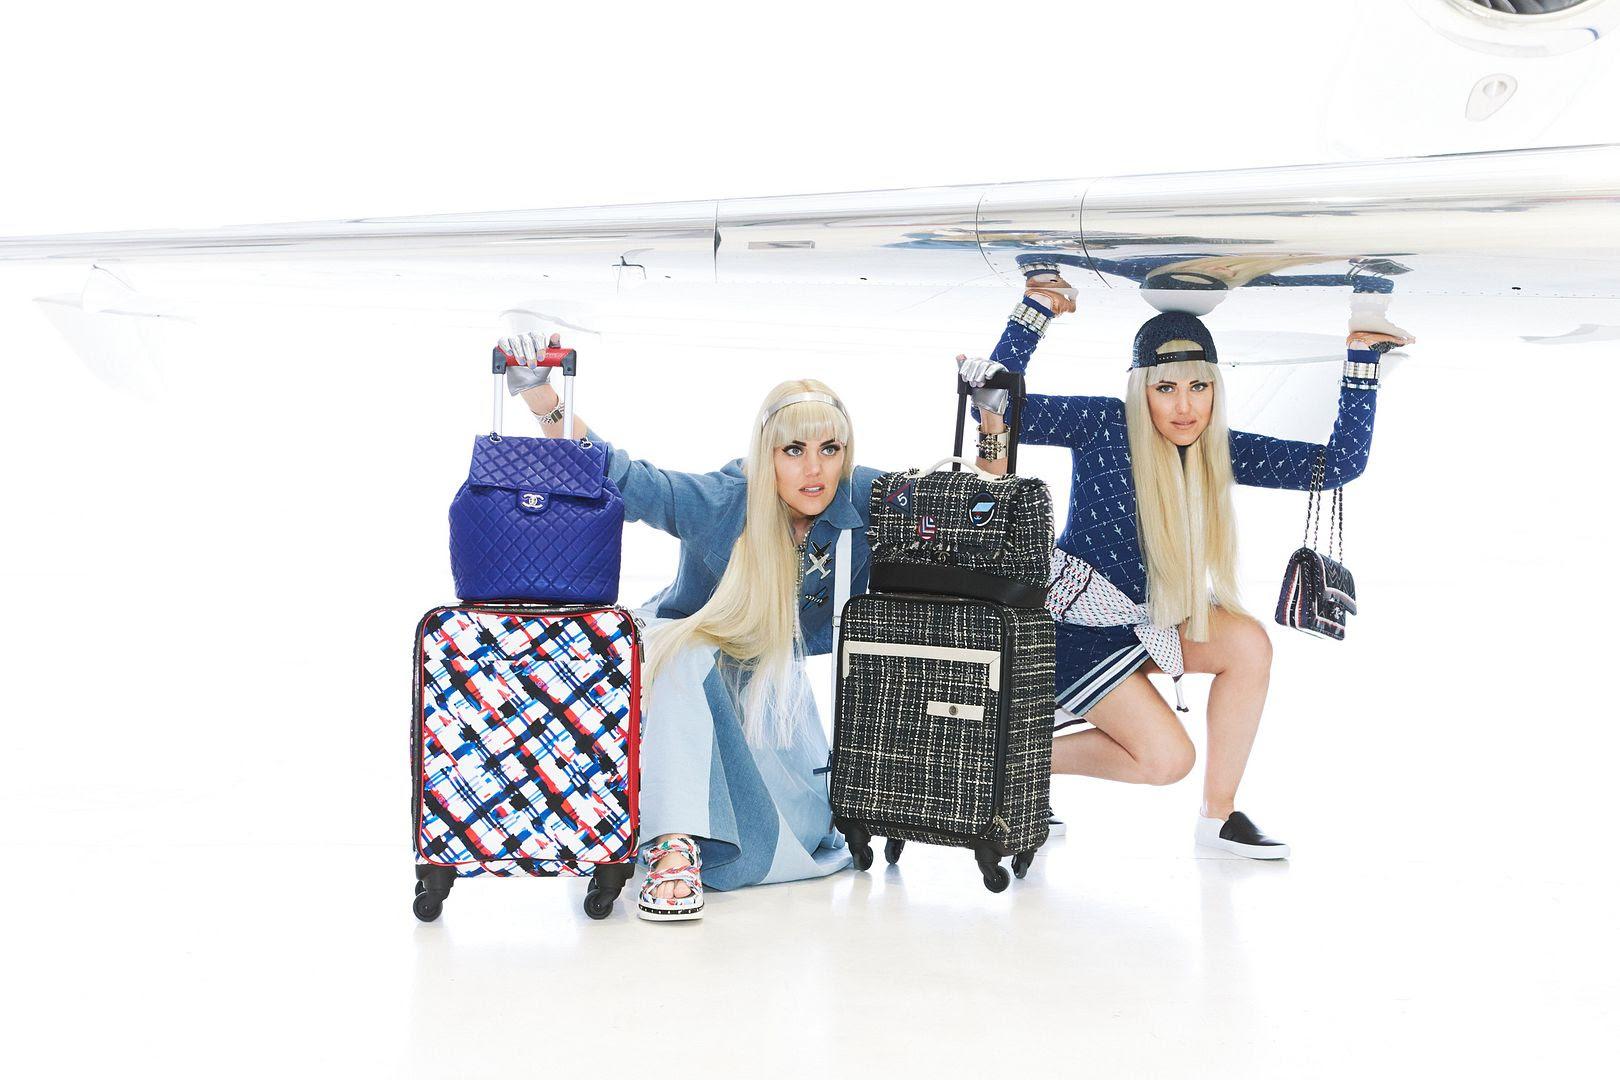 photo chanelluggage-chanelairlines-beckermangirls-twins-sisters-chanelcanada-travelling-sisters-blog-hangartoronto_zpskg69xizk.jpg